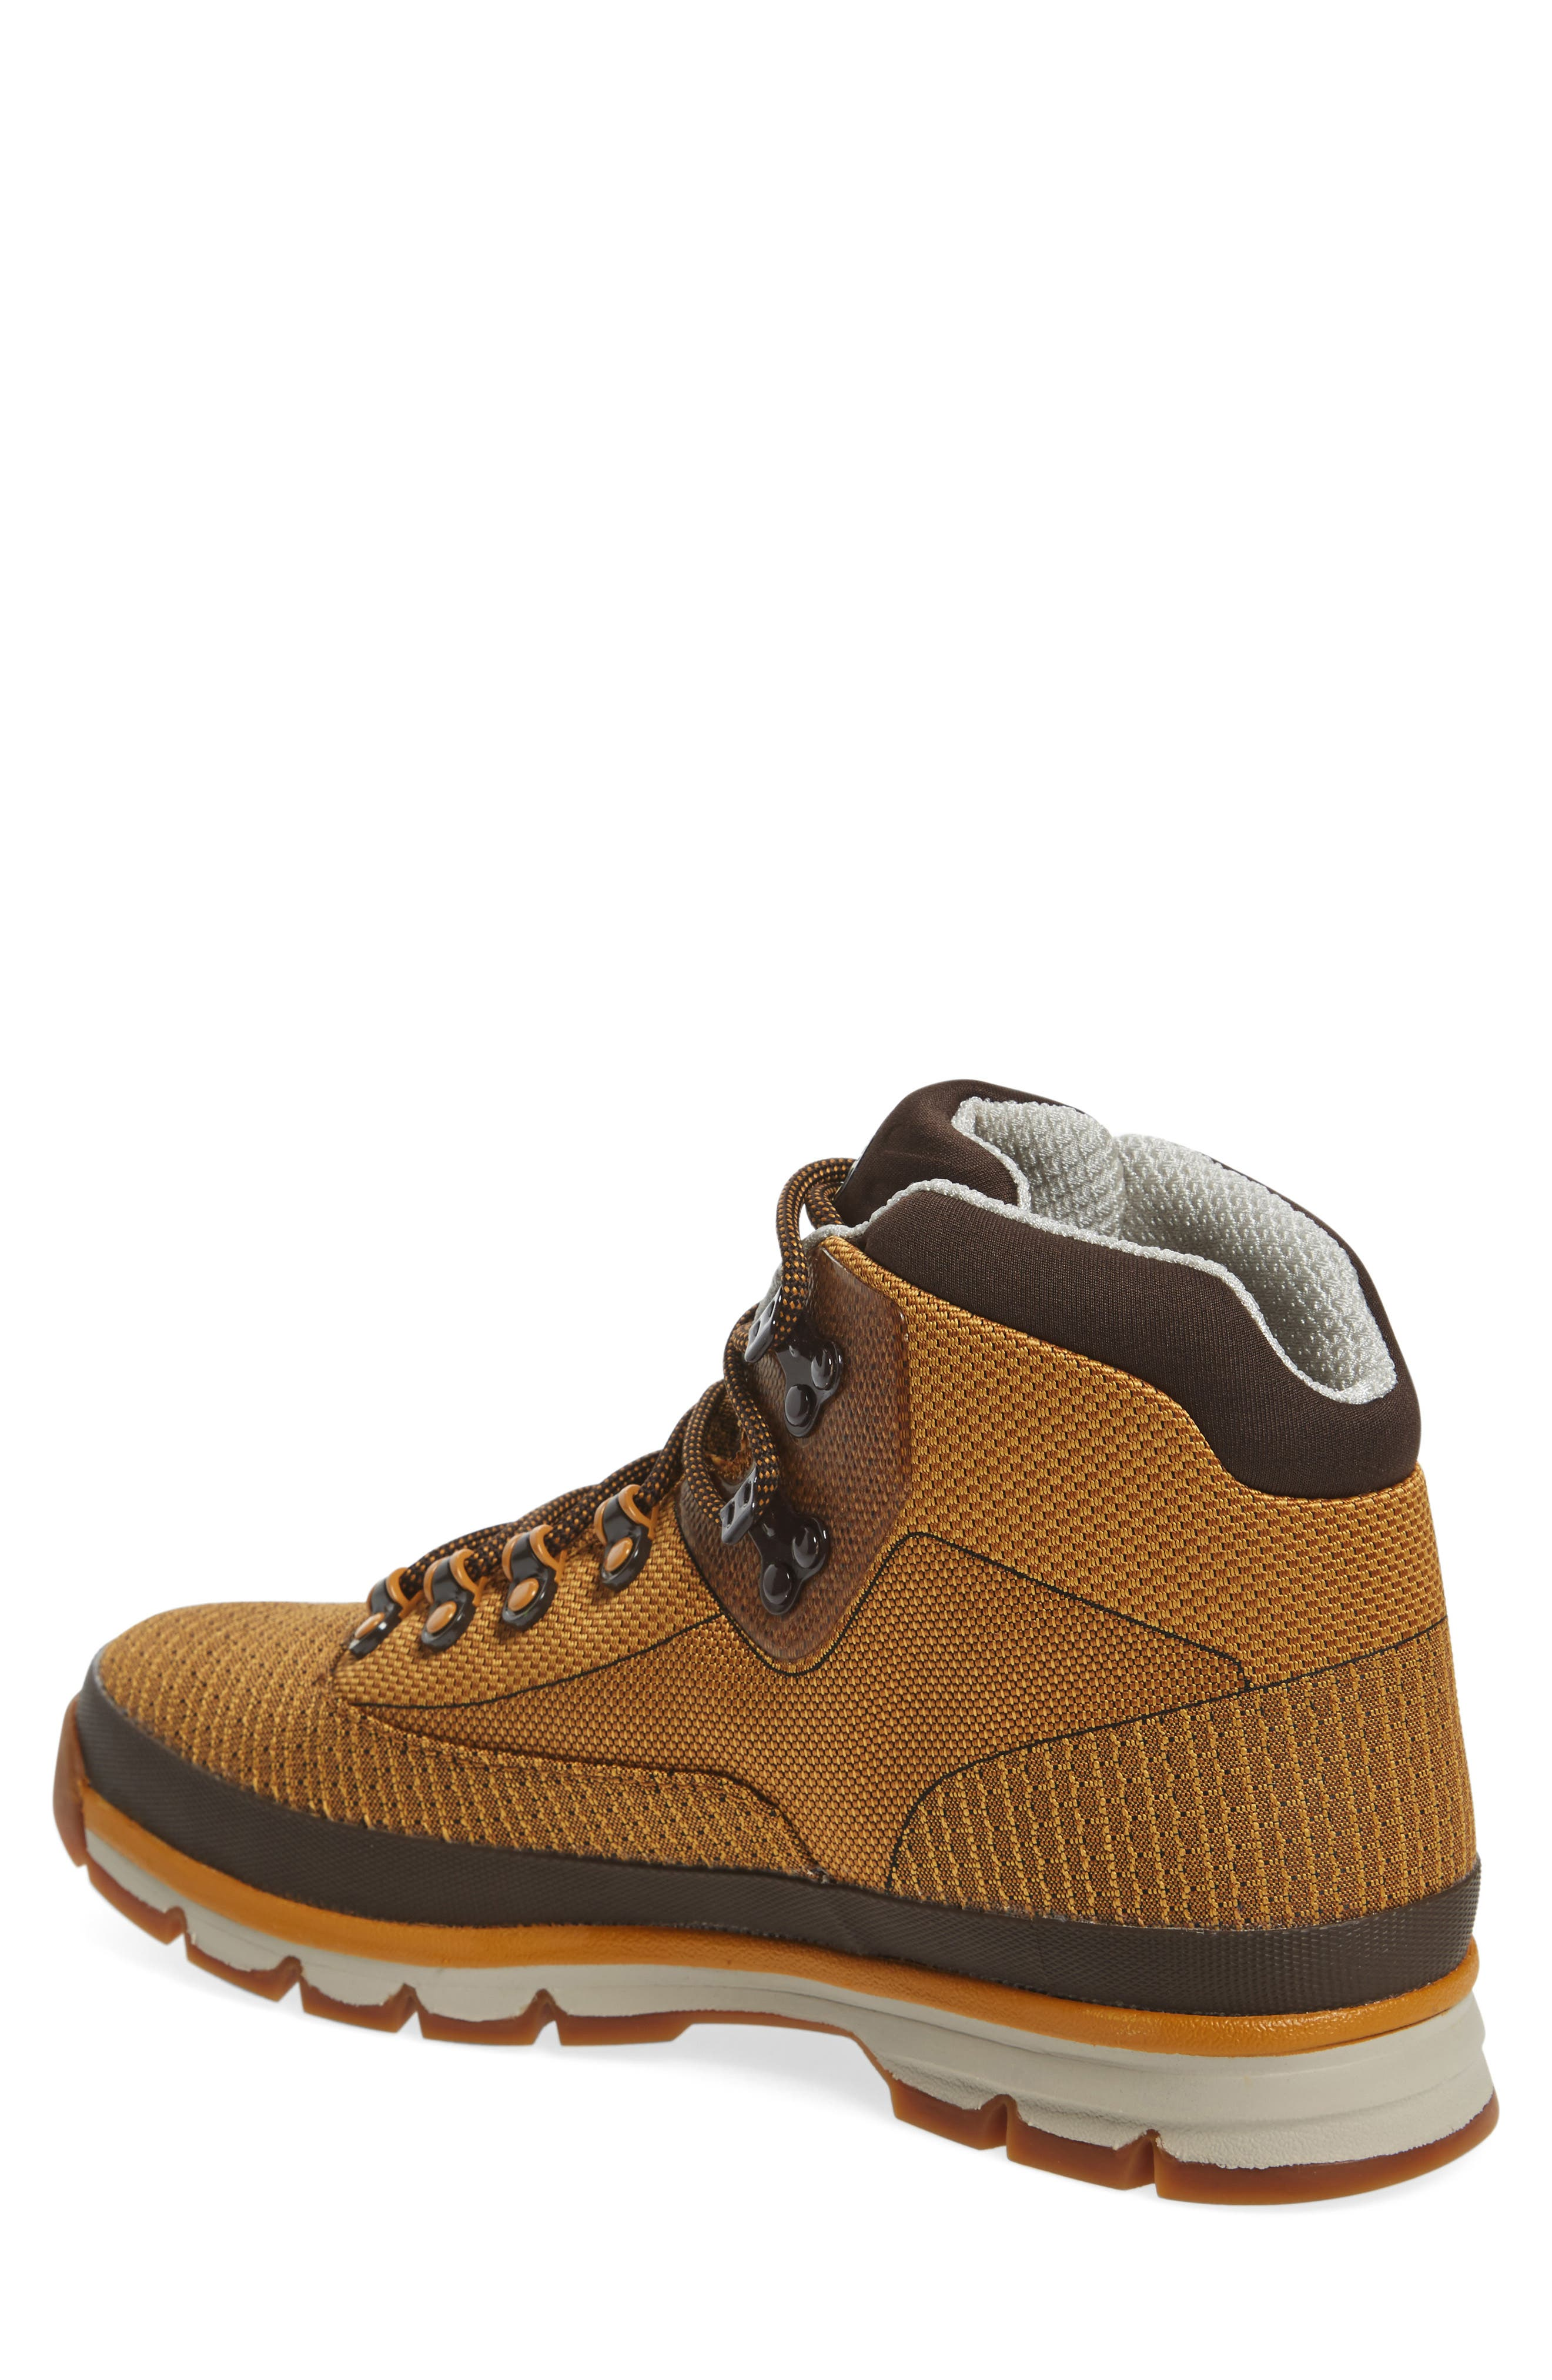 Euro Hiker Boot,                             Alternate thumbnail 2, color,                             210